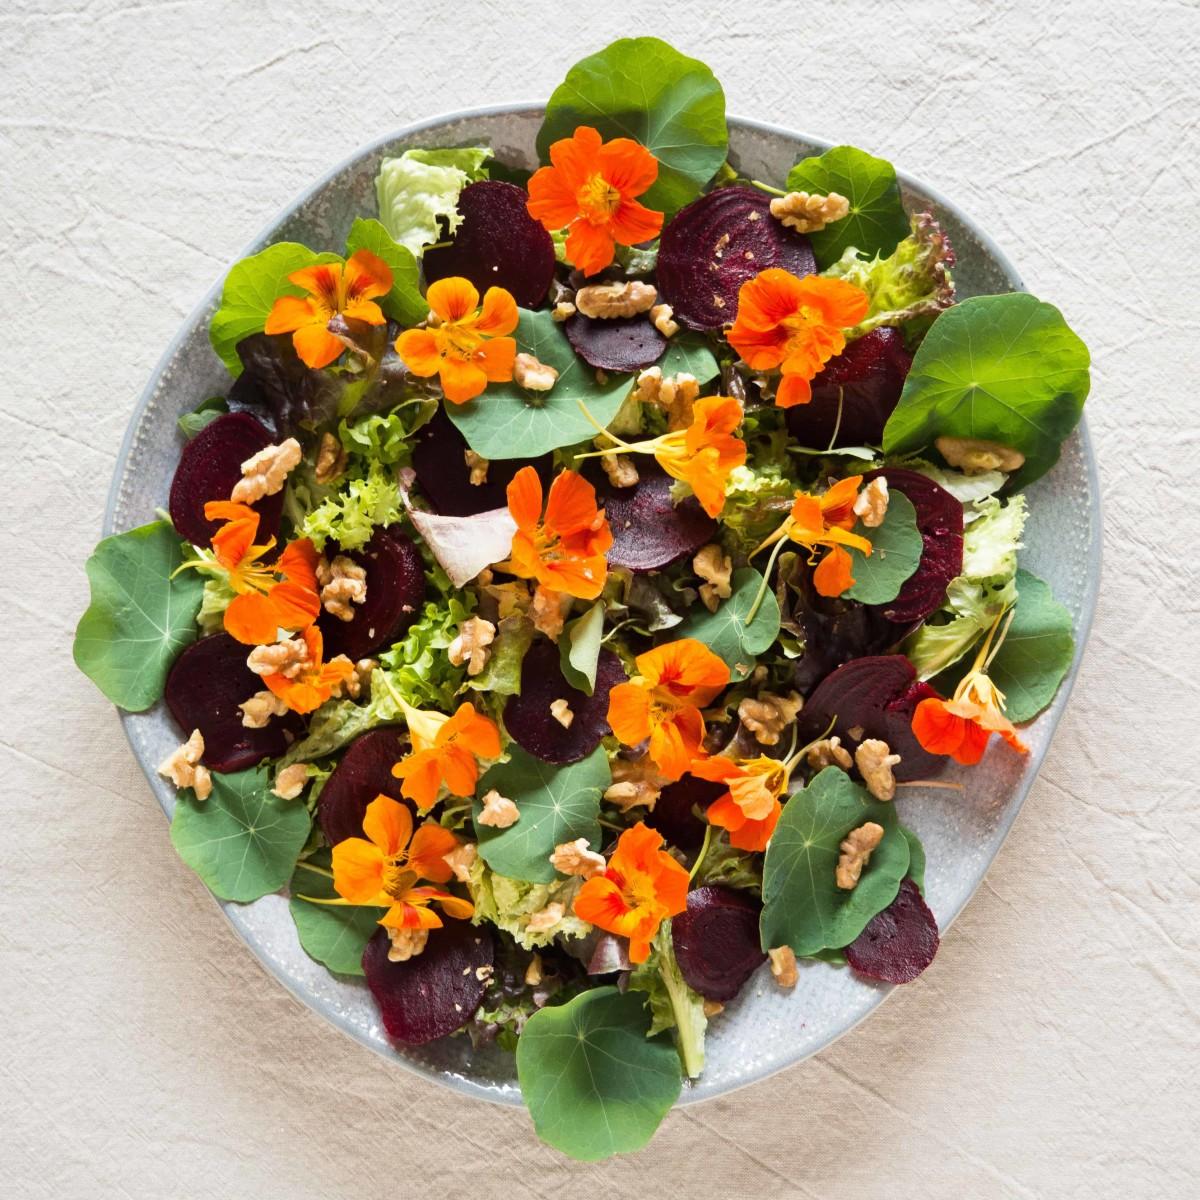 Nasturtium, beetroot, and walnut salad